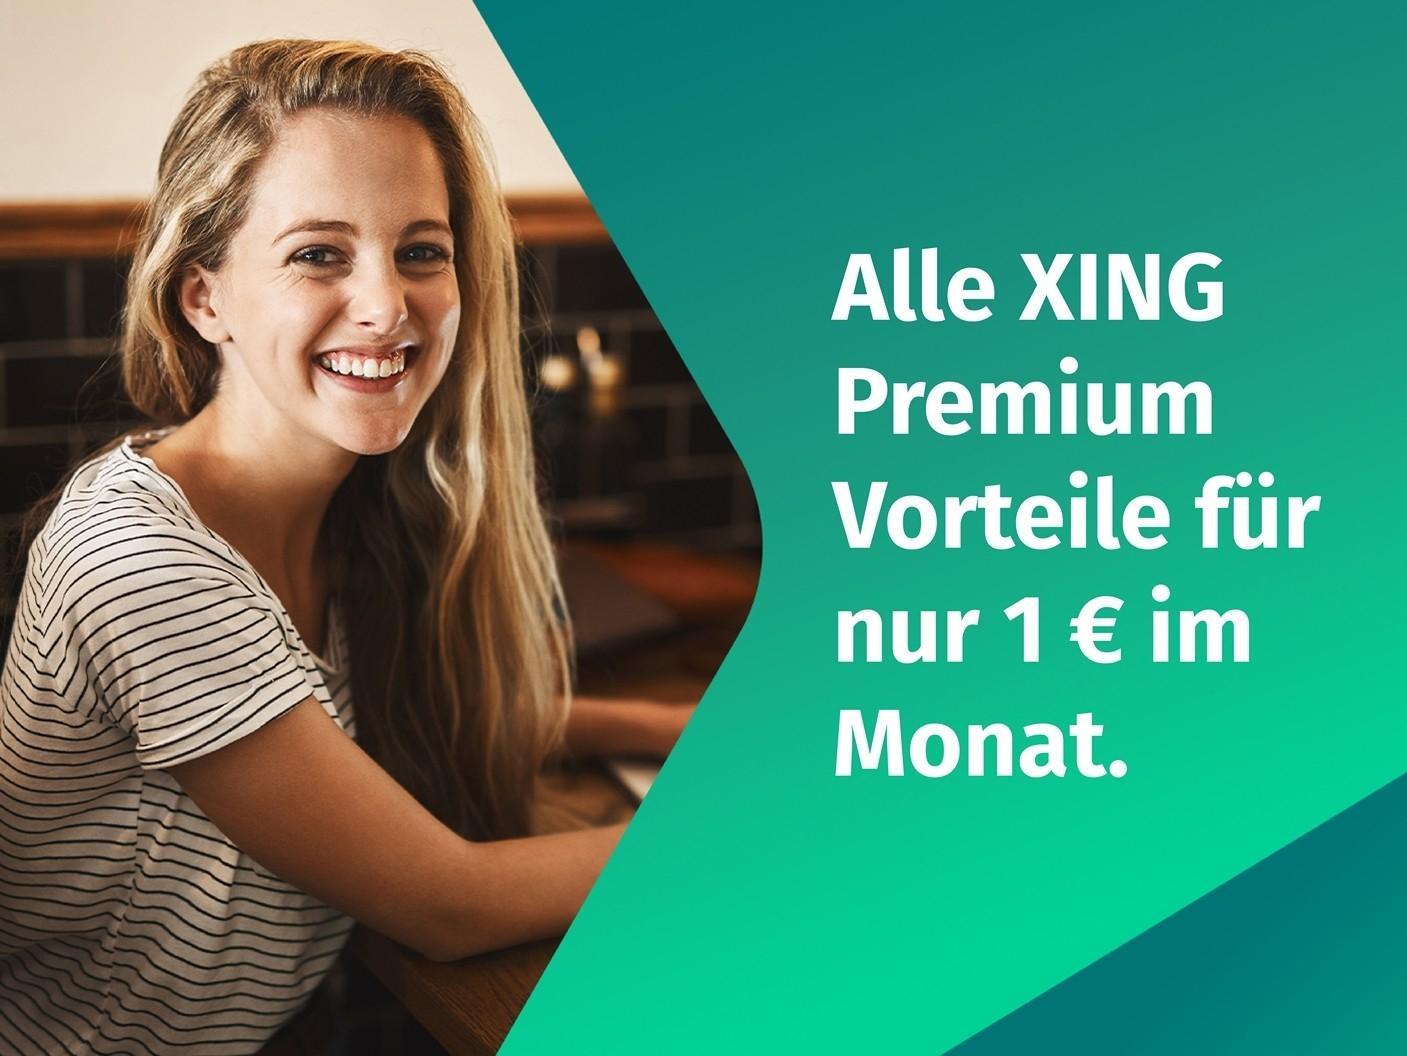 XING Premium für nur 1 € im Monat | Studenten